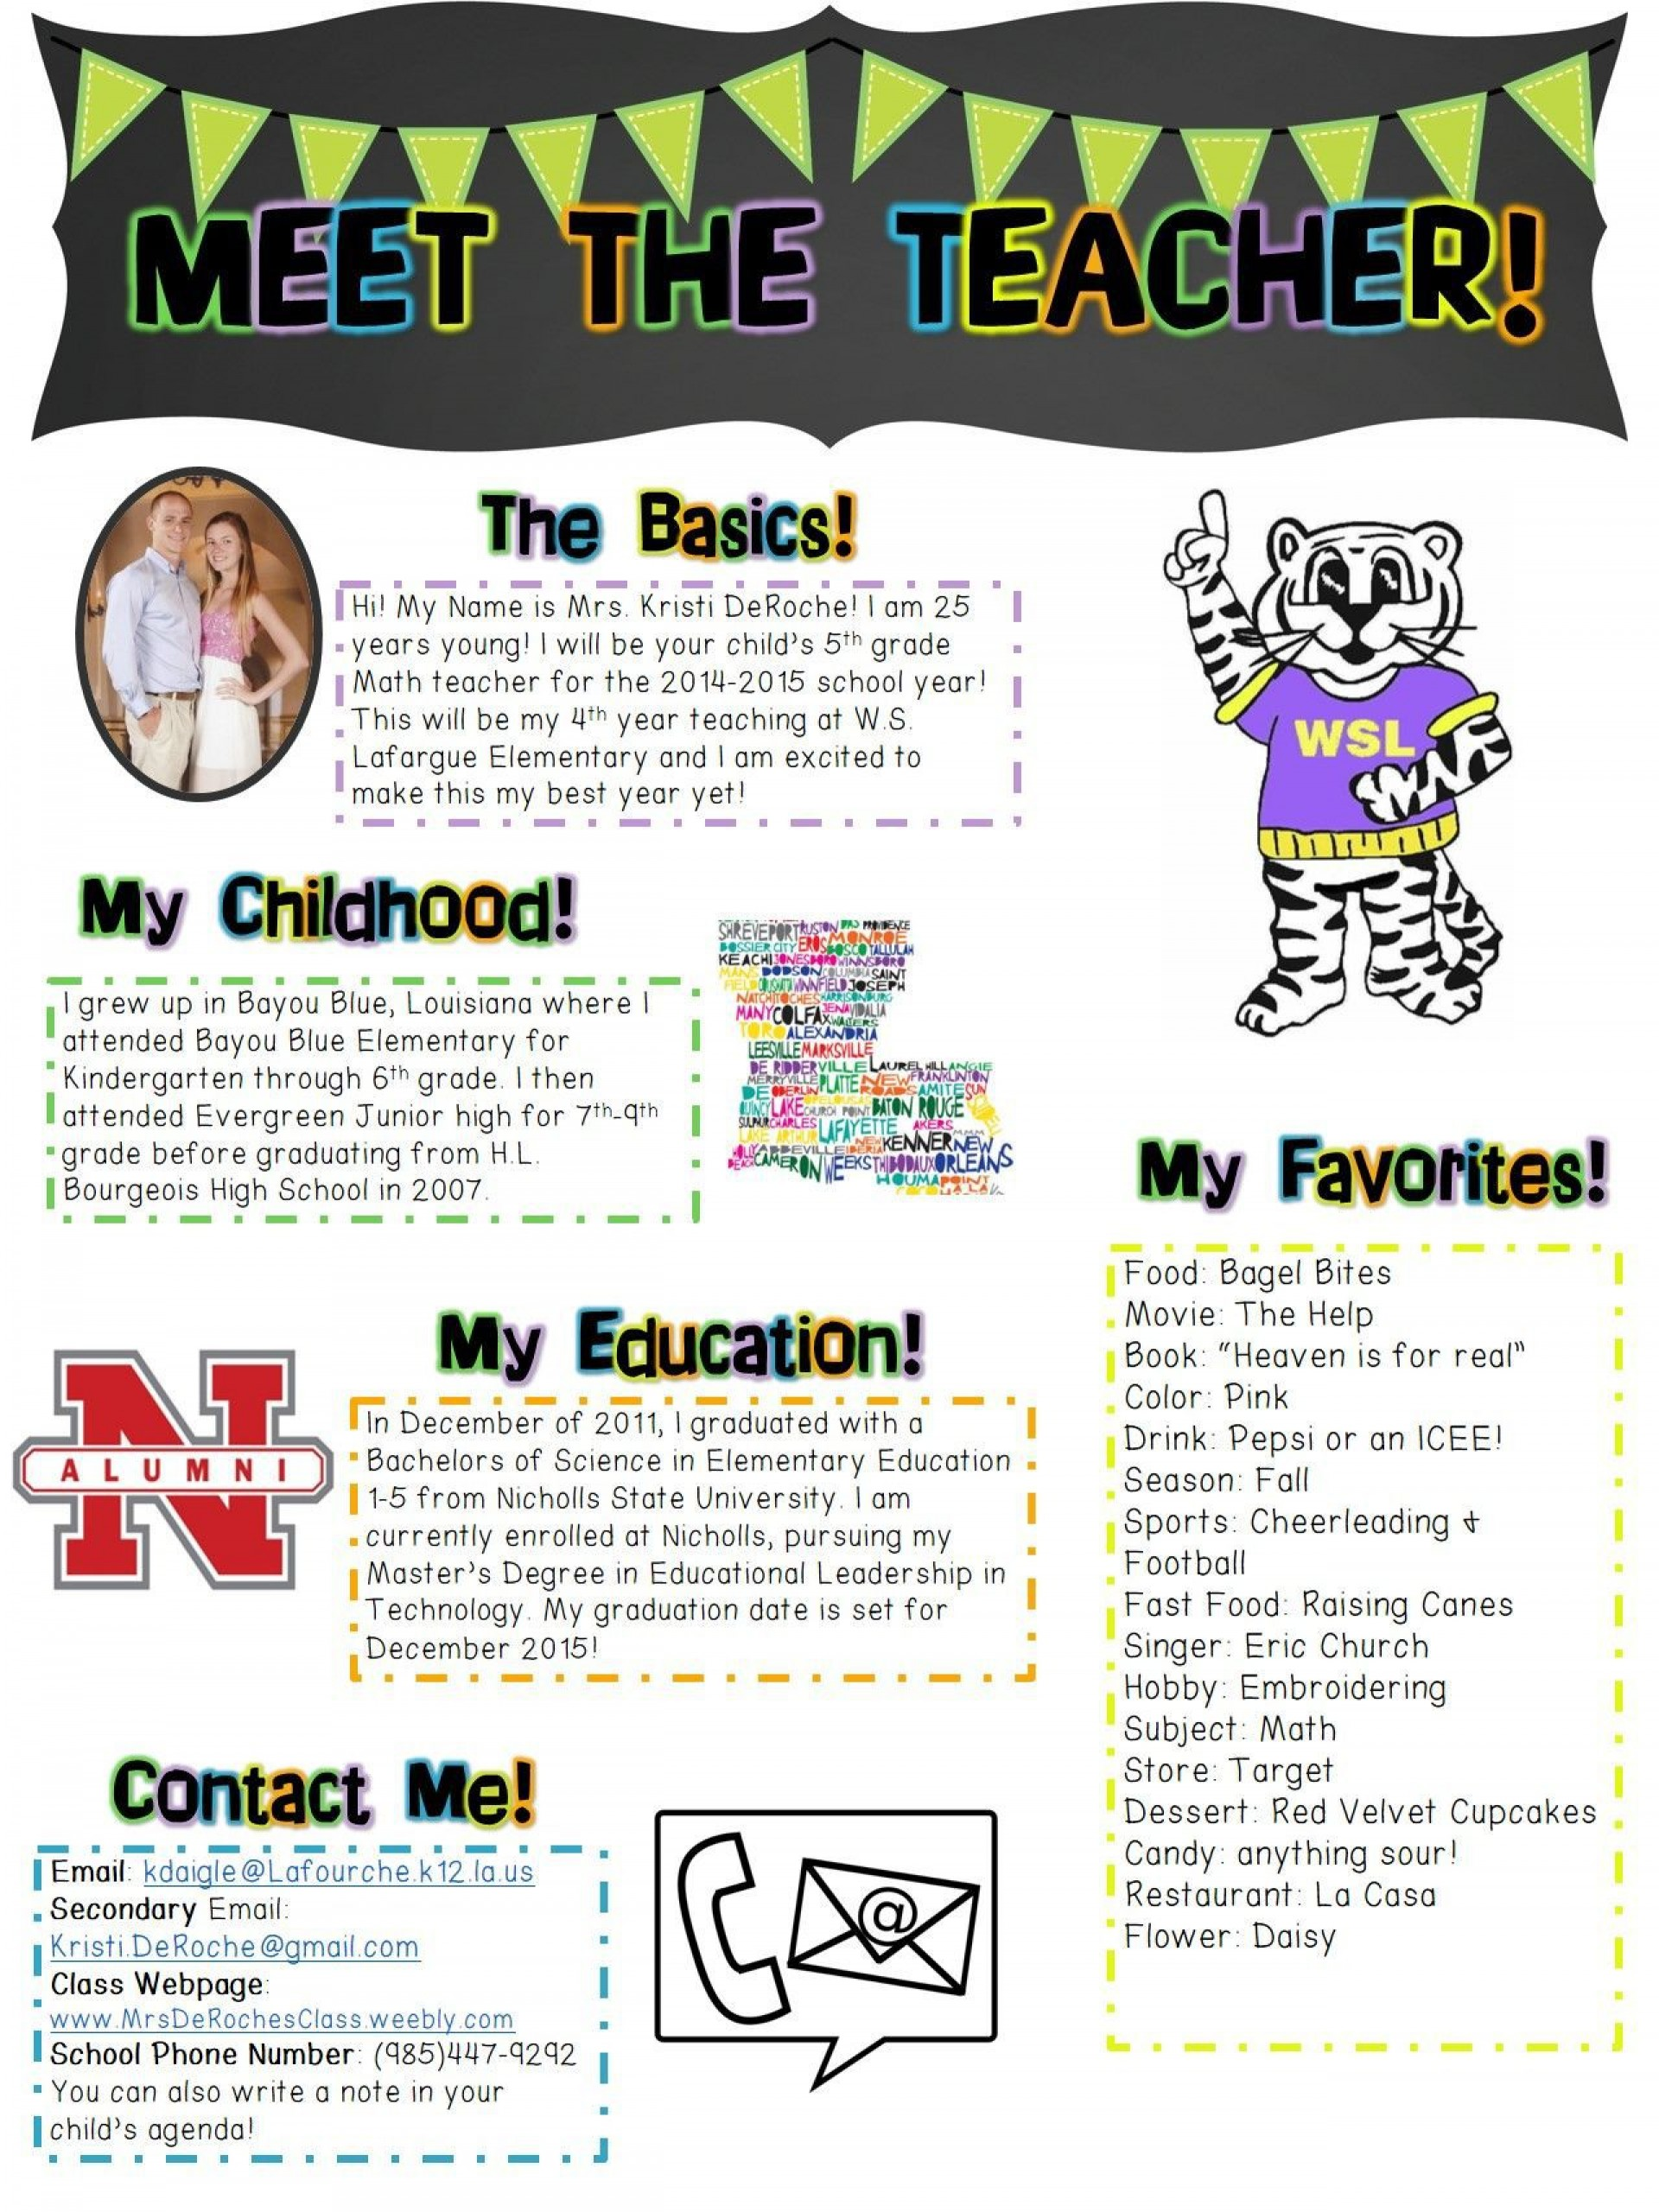 000 Surprising Newsletter Template For Teacher Highest Clarity  Teachers To Parent Printable Free School1920